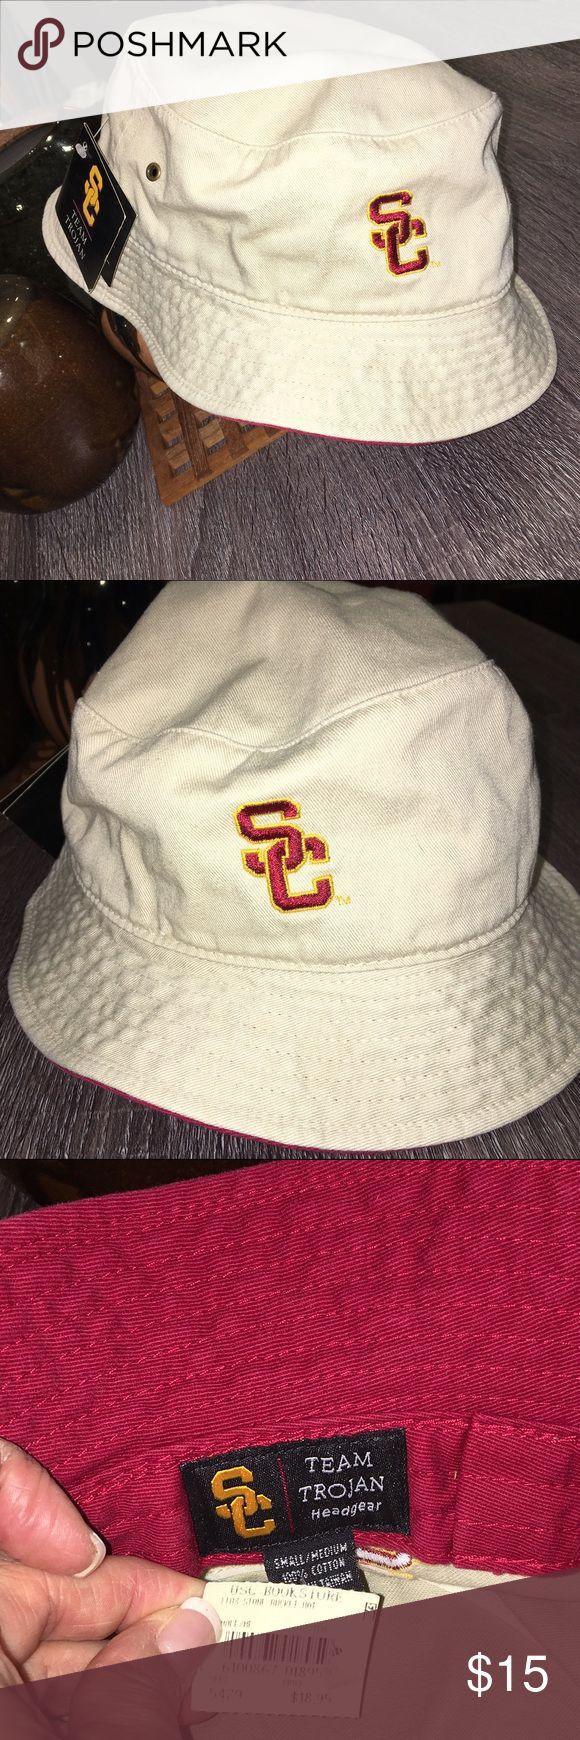 check out caedb b05e3 ... sale new usc bucket hat buckets khakis and cotton c7e50 999e9